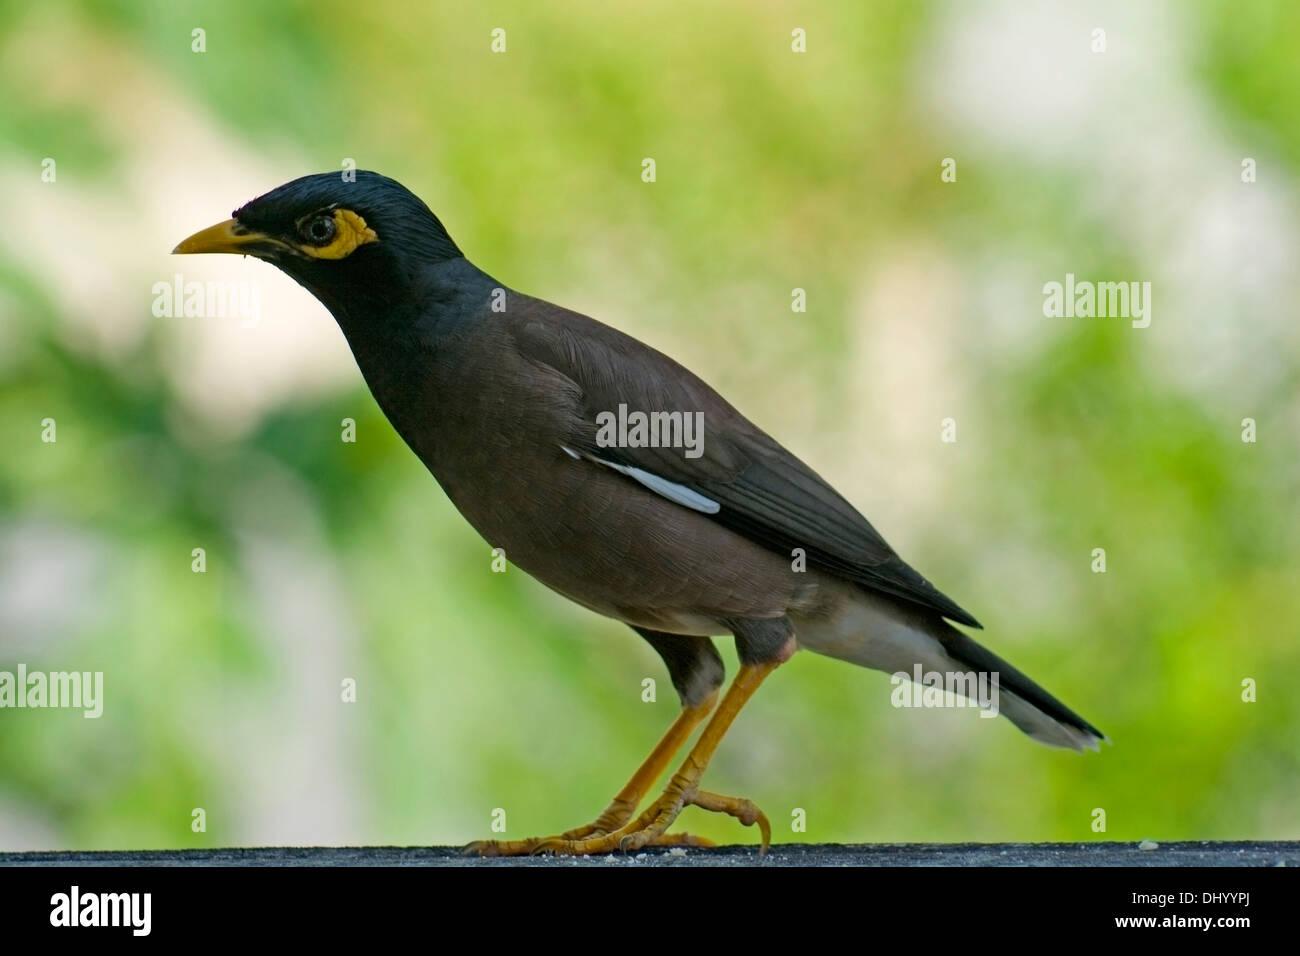 Mynah Bird Asia species Acridotheres tristis - Stock Image